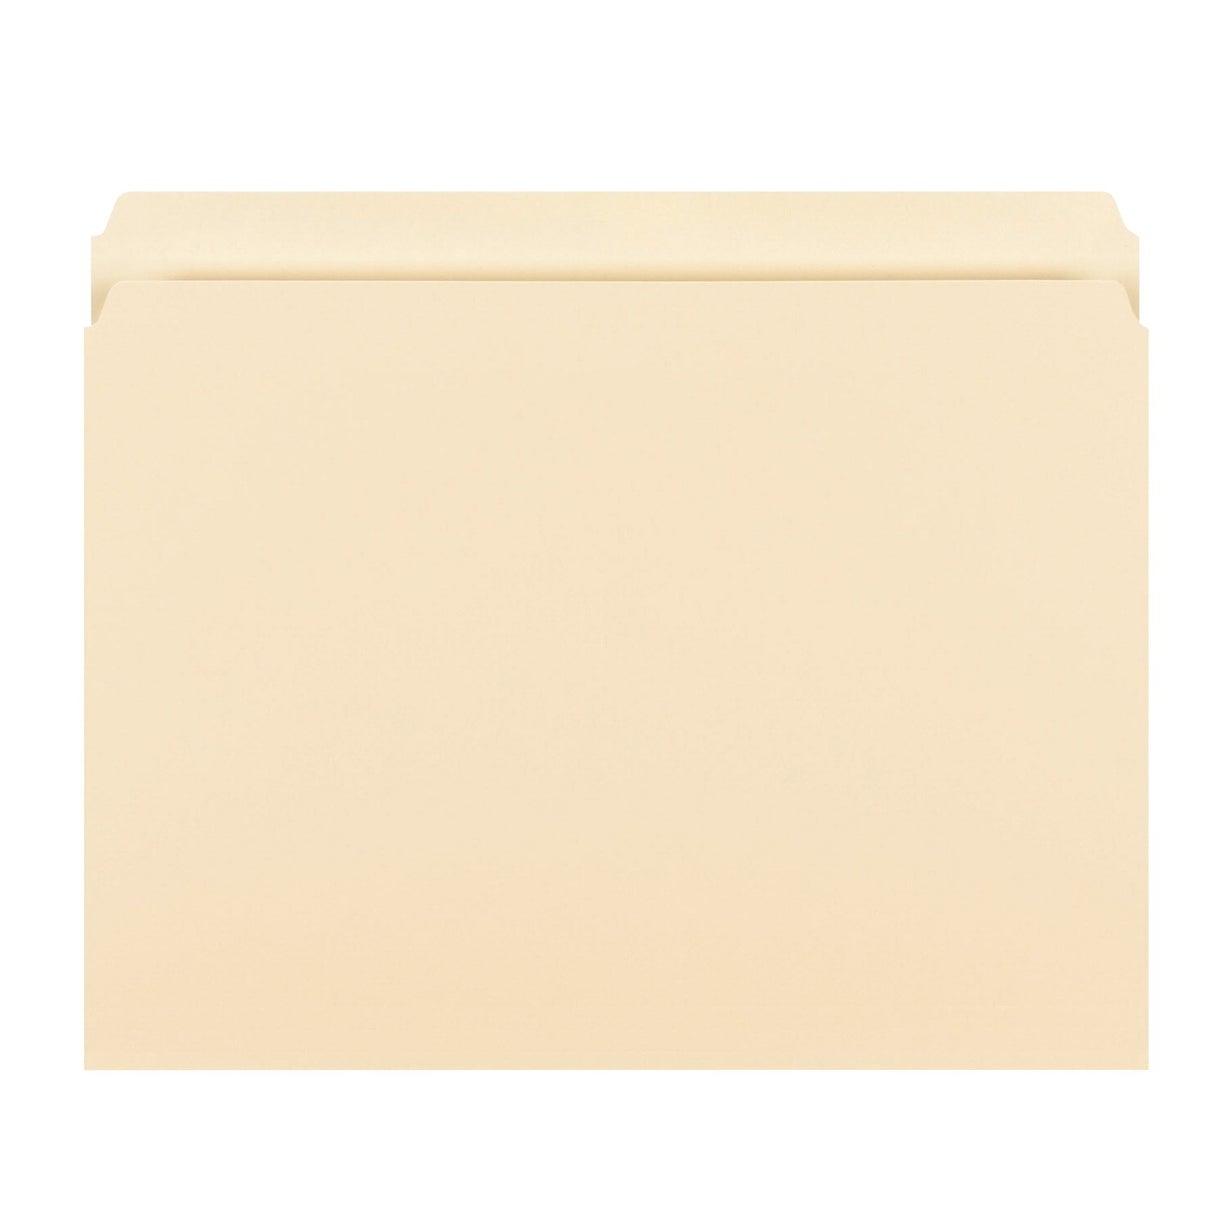 100 Pk Pendaflex File Folders Straight Cut Top Tab Letter Size Manila